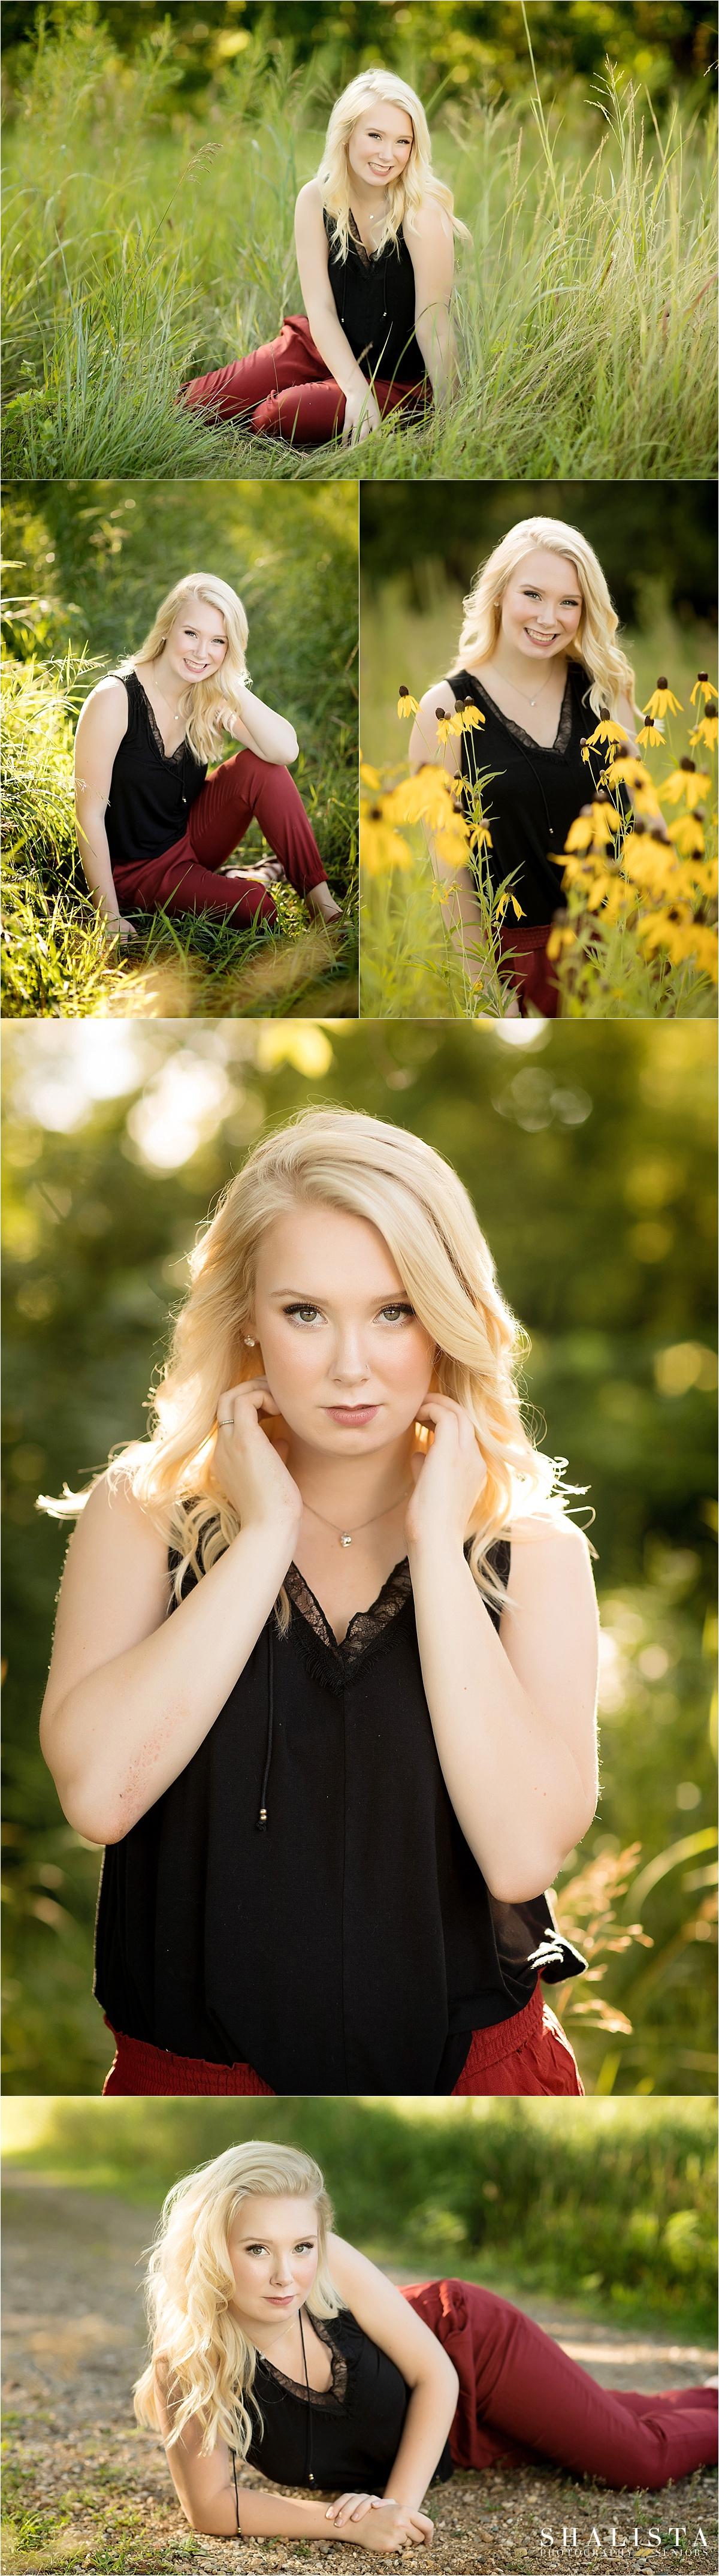 Beautiful summer senior girl photography